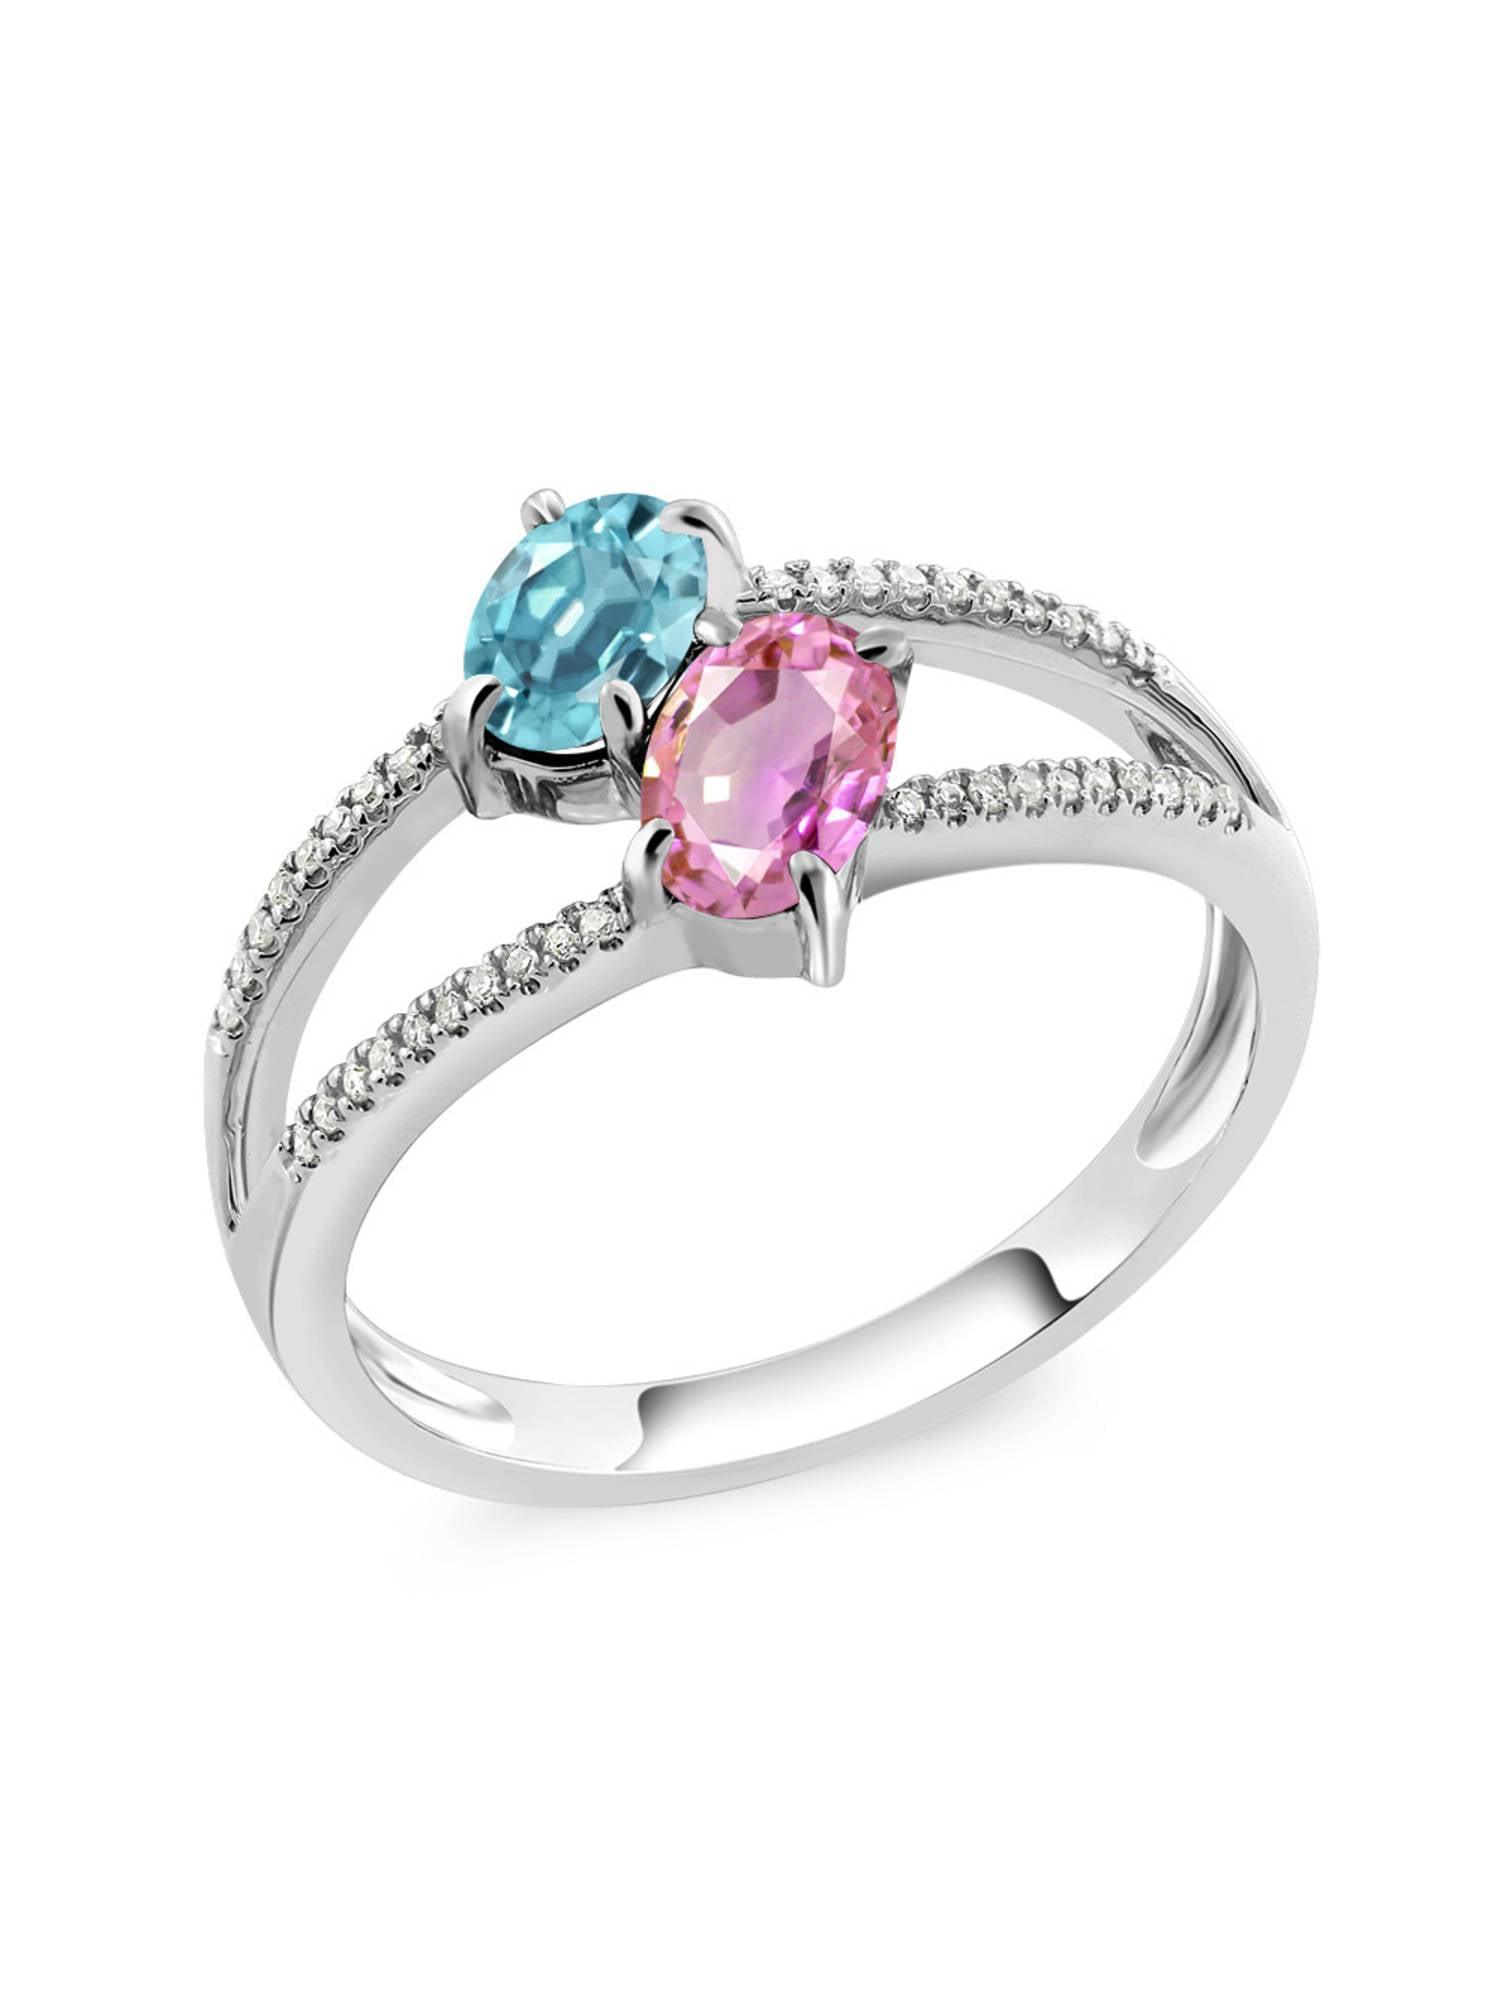 1.58 Ct Blue Zircon Pink Sapphire Diamond 10K White Gold Ring by